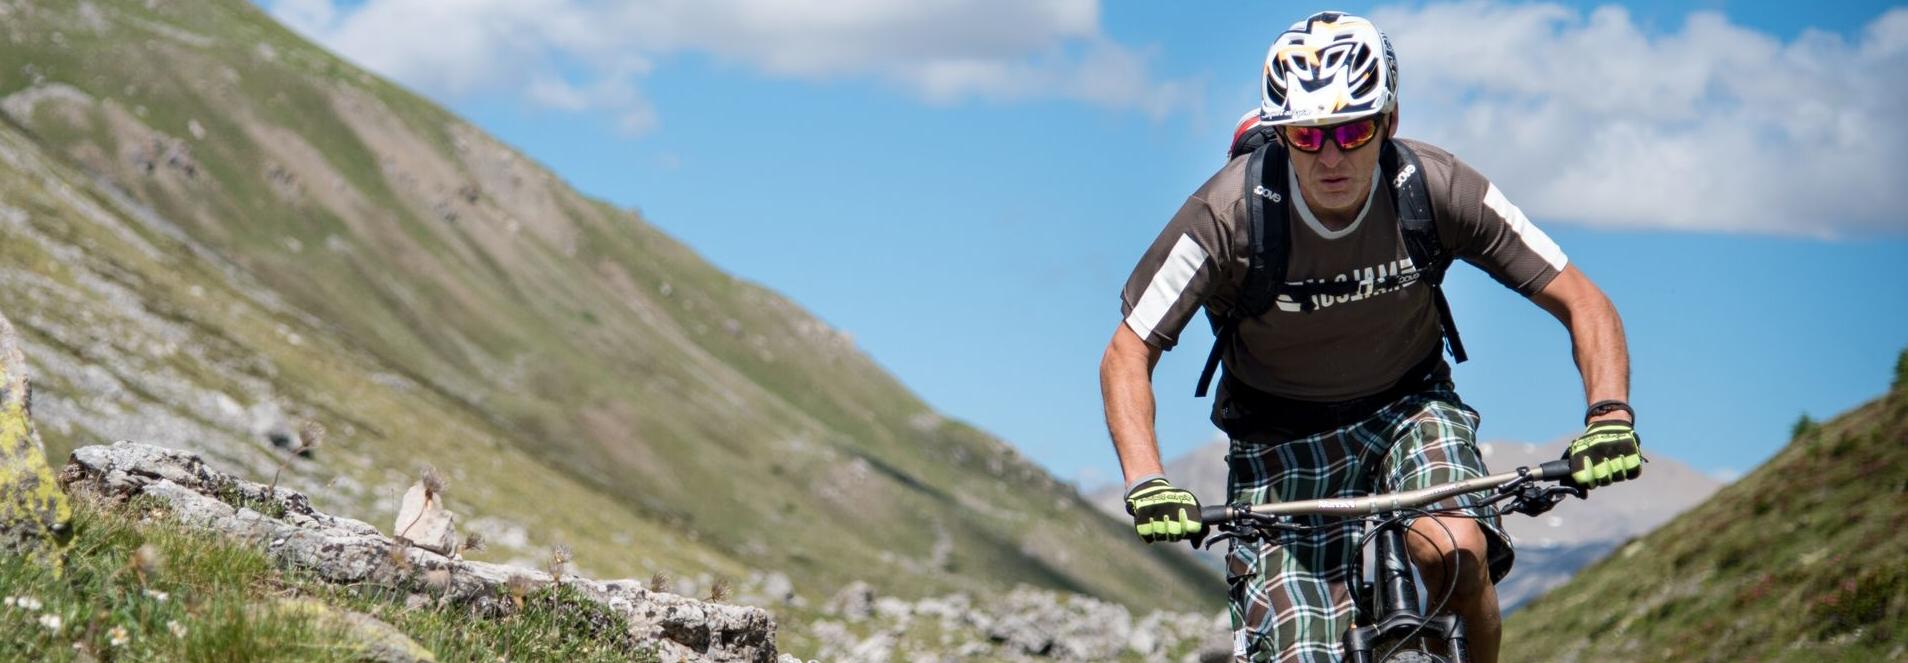 Sentriero_Bike